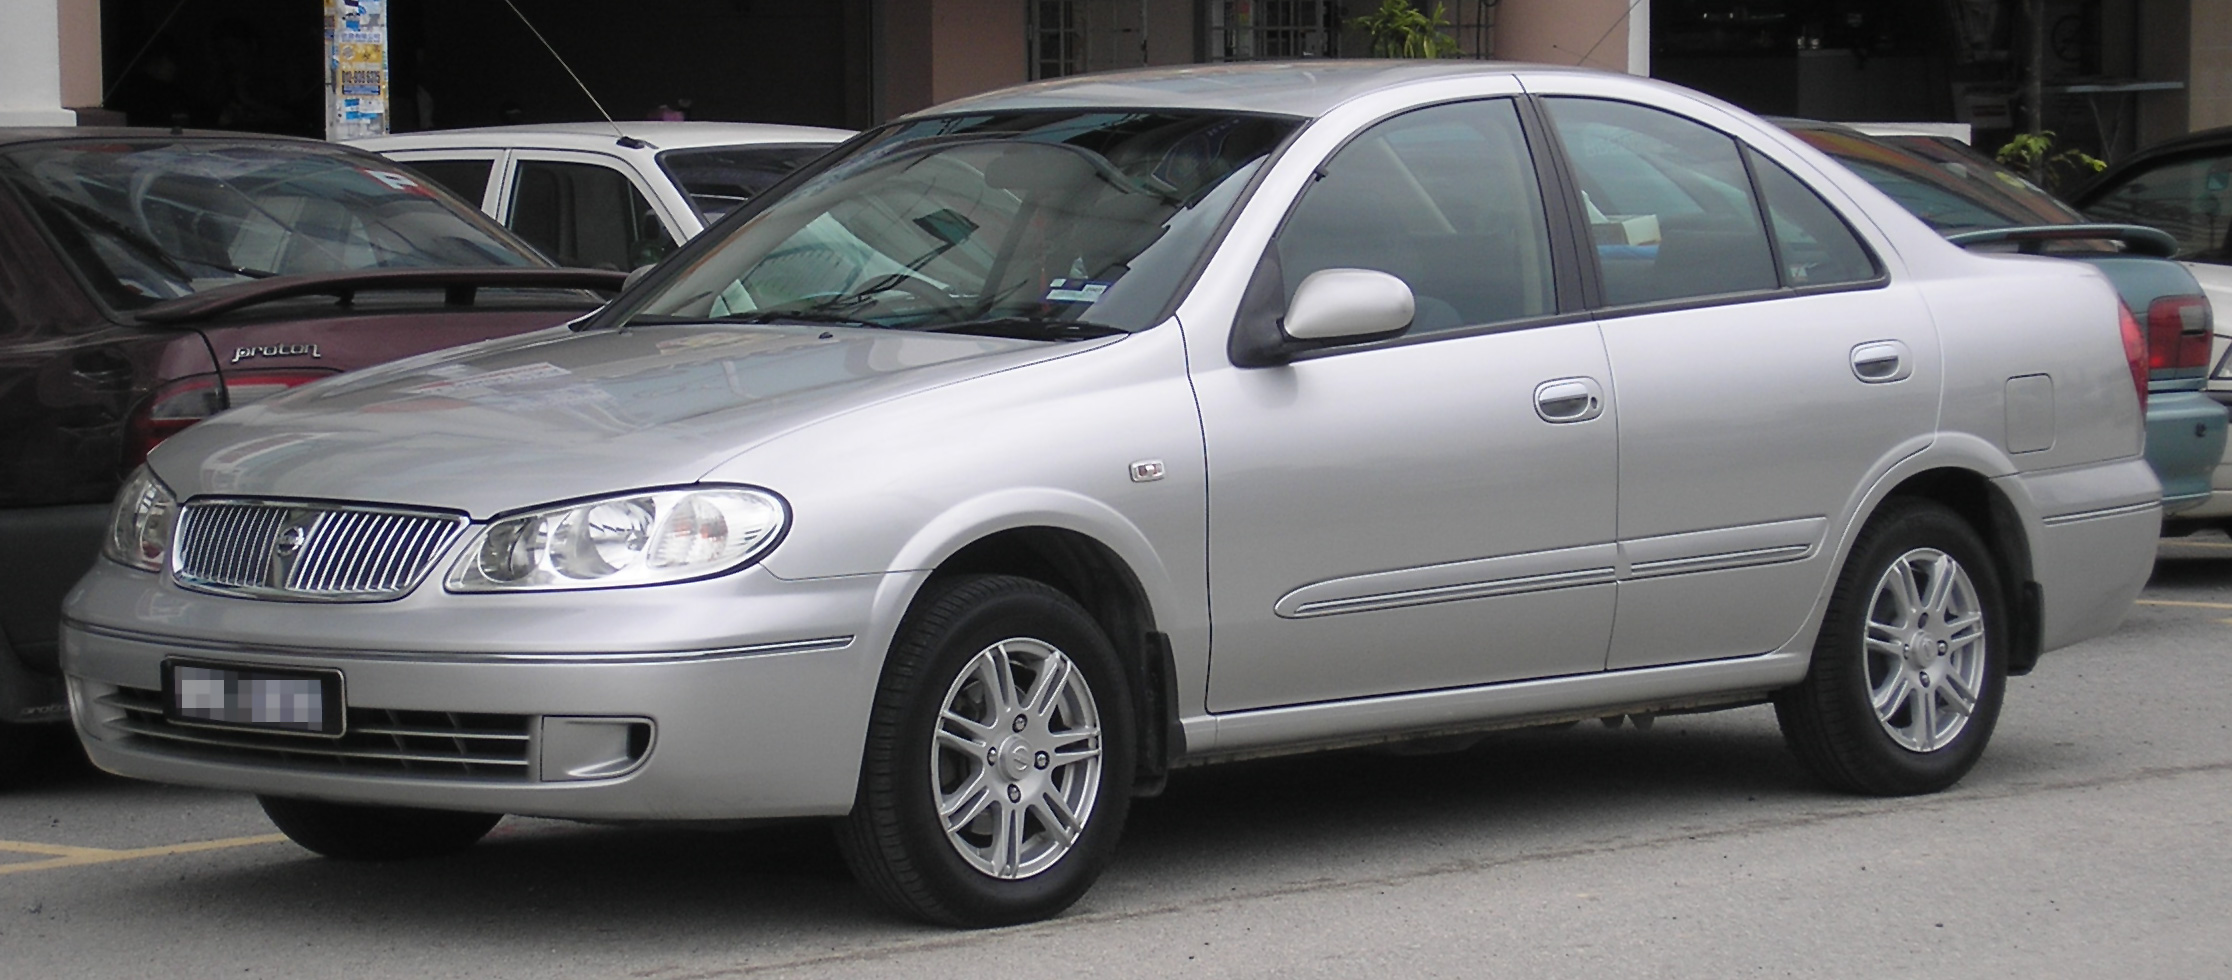 2006 Nissan Sentra Manual